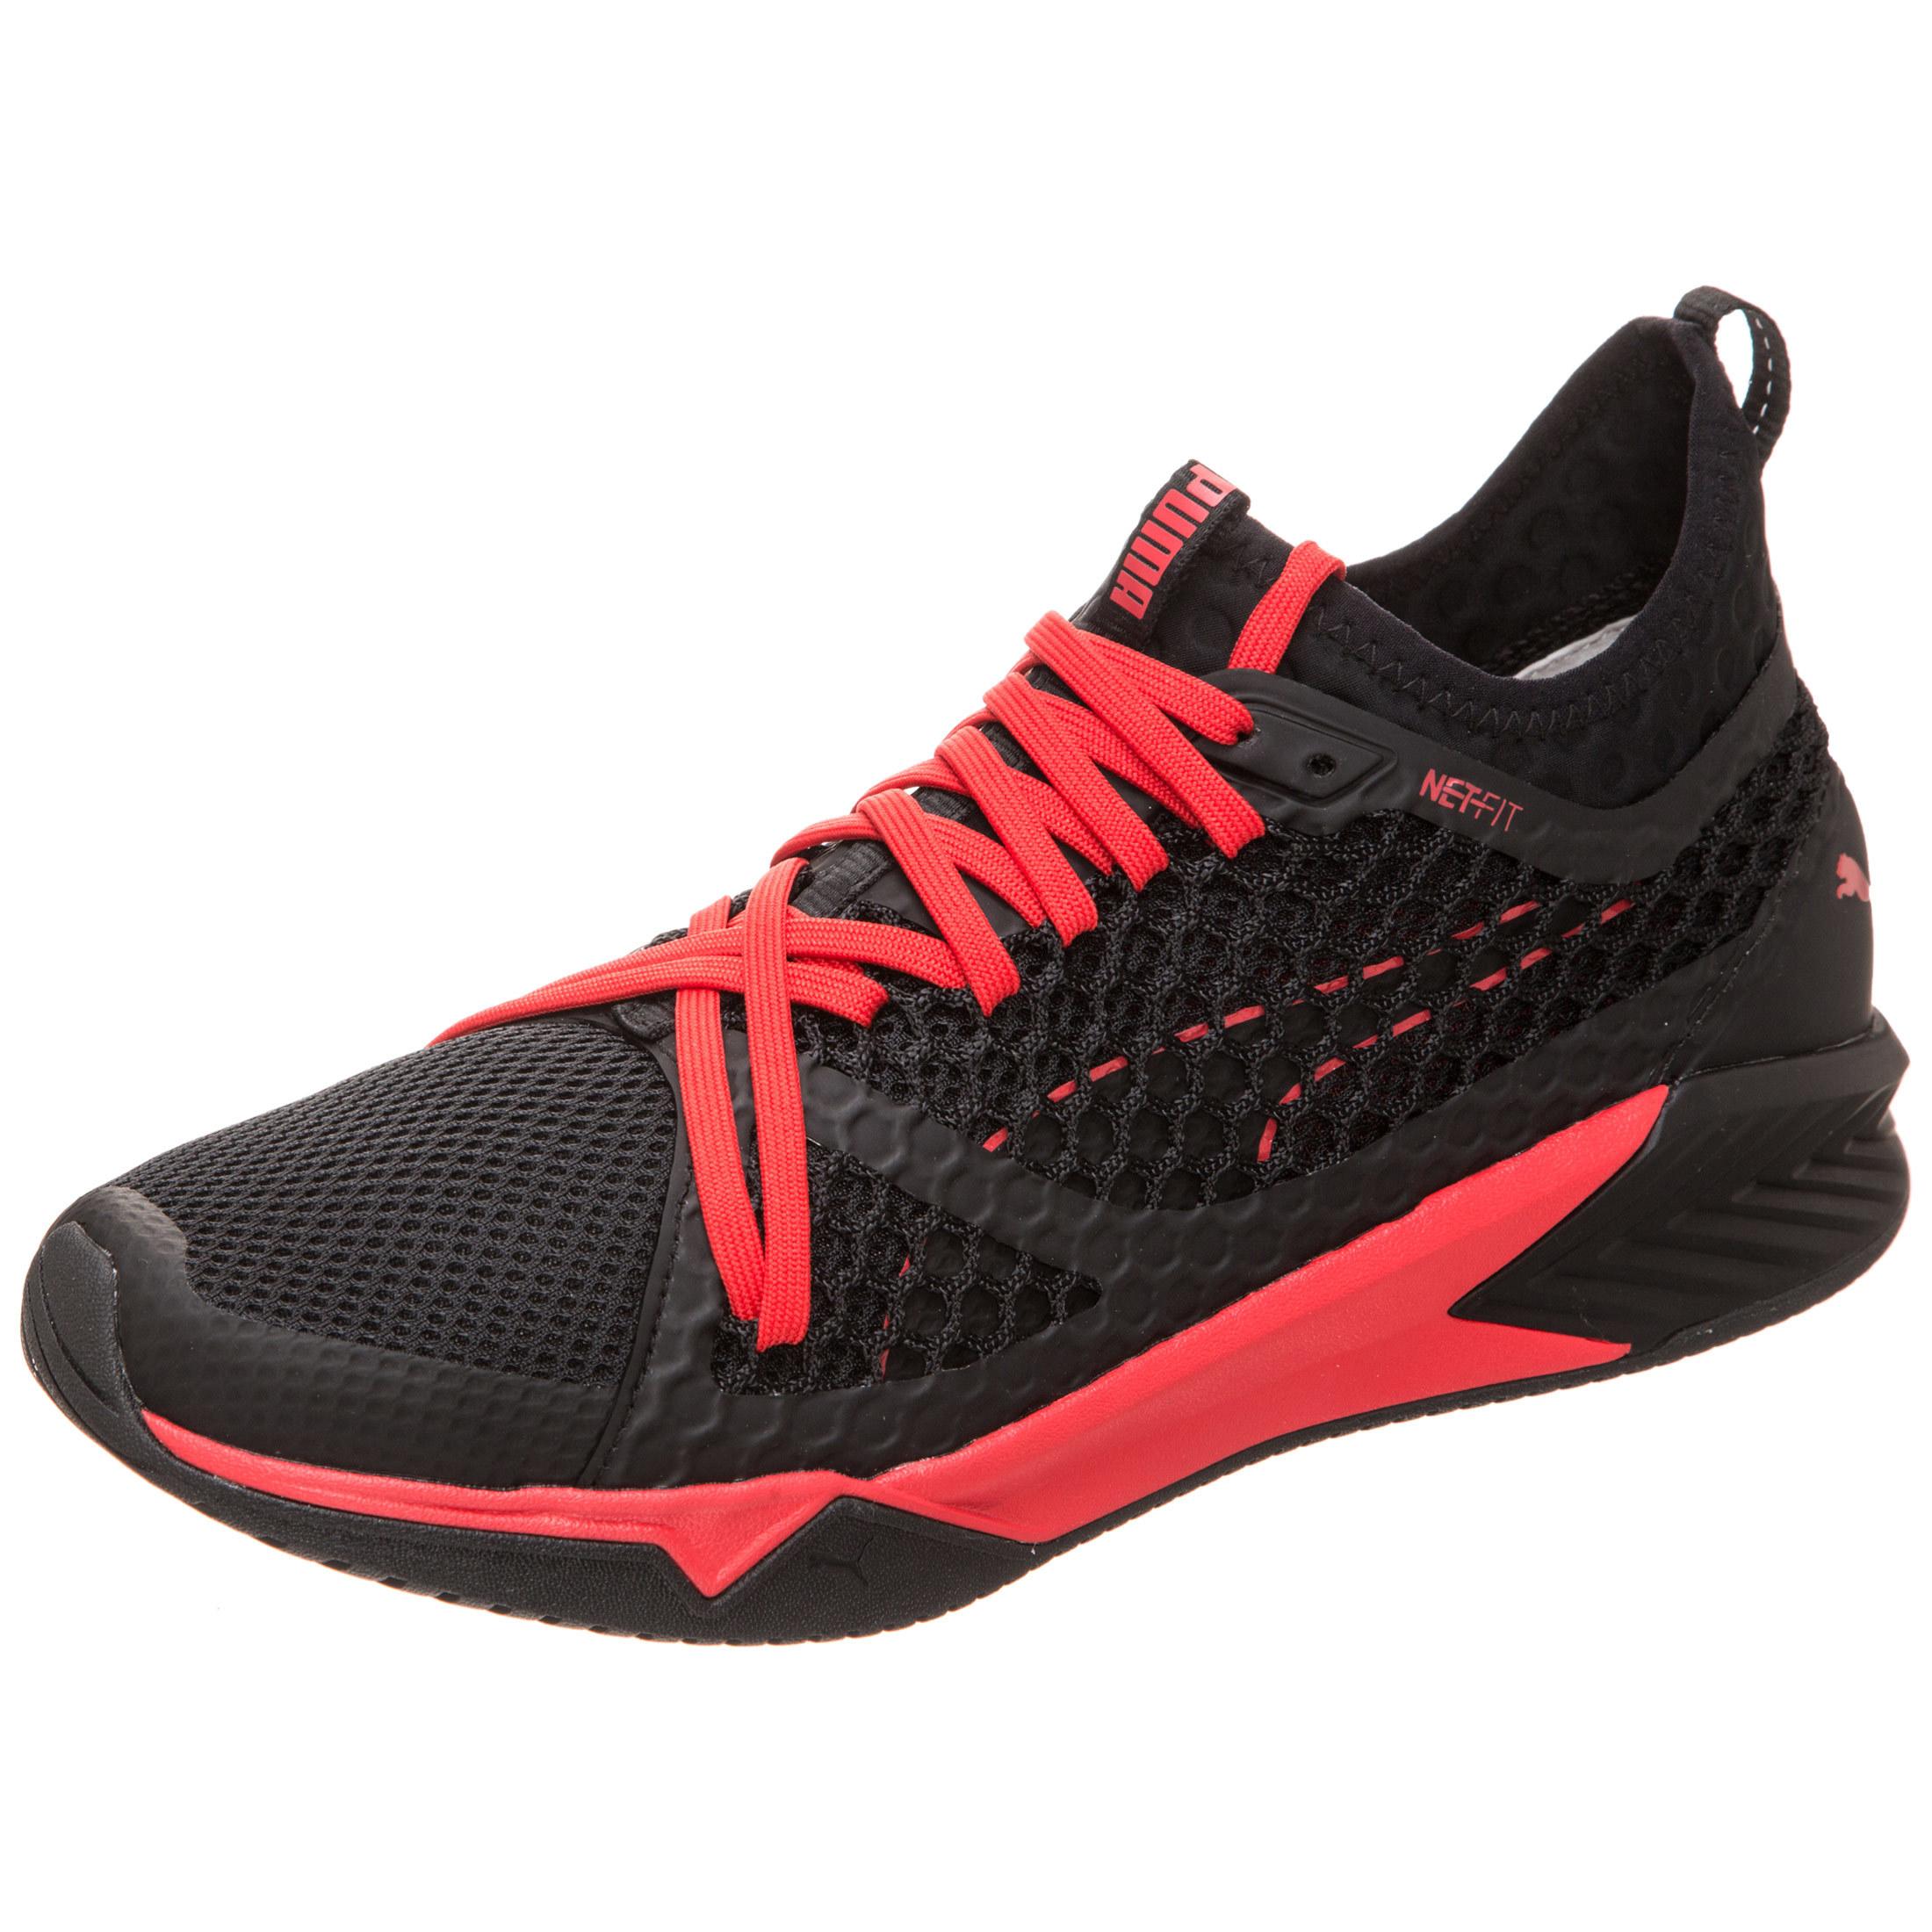 96223a40 Puma IGNITE XT NETFIT Men's Training Shoes | 190057_06 | FOOTY.COM